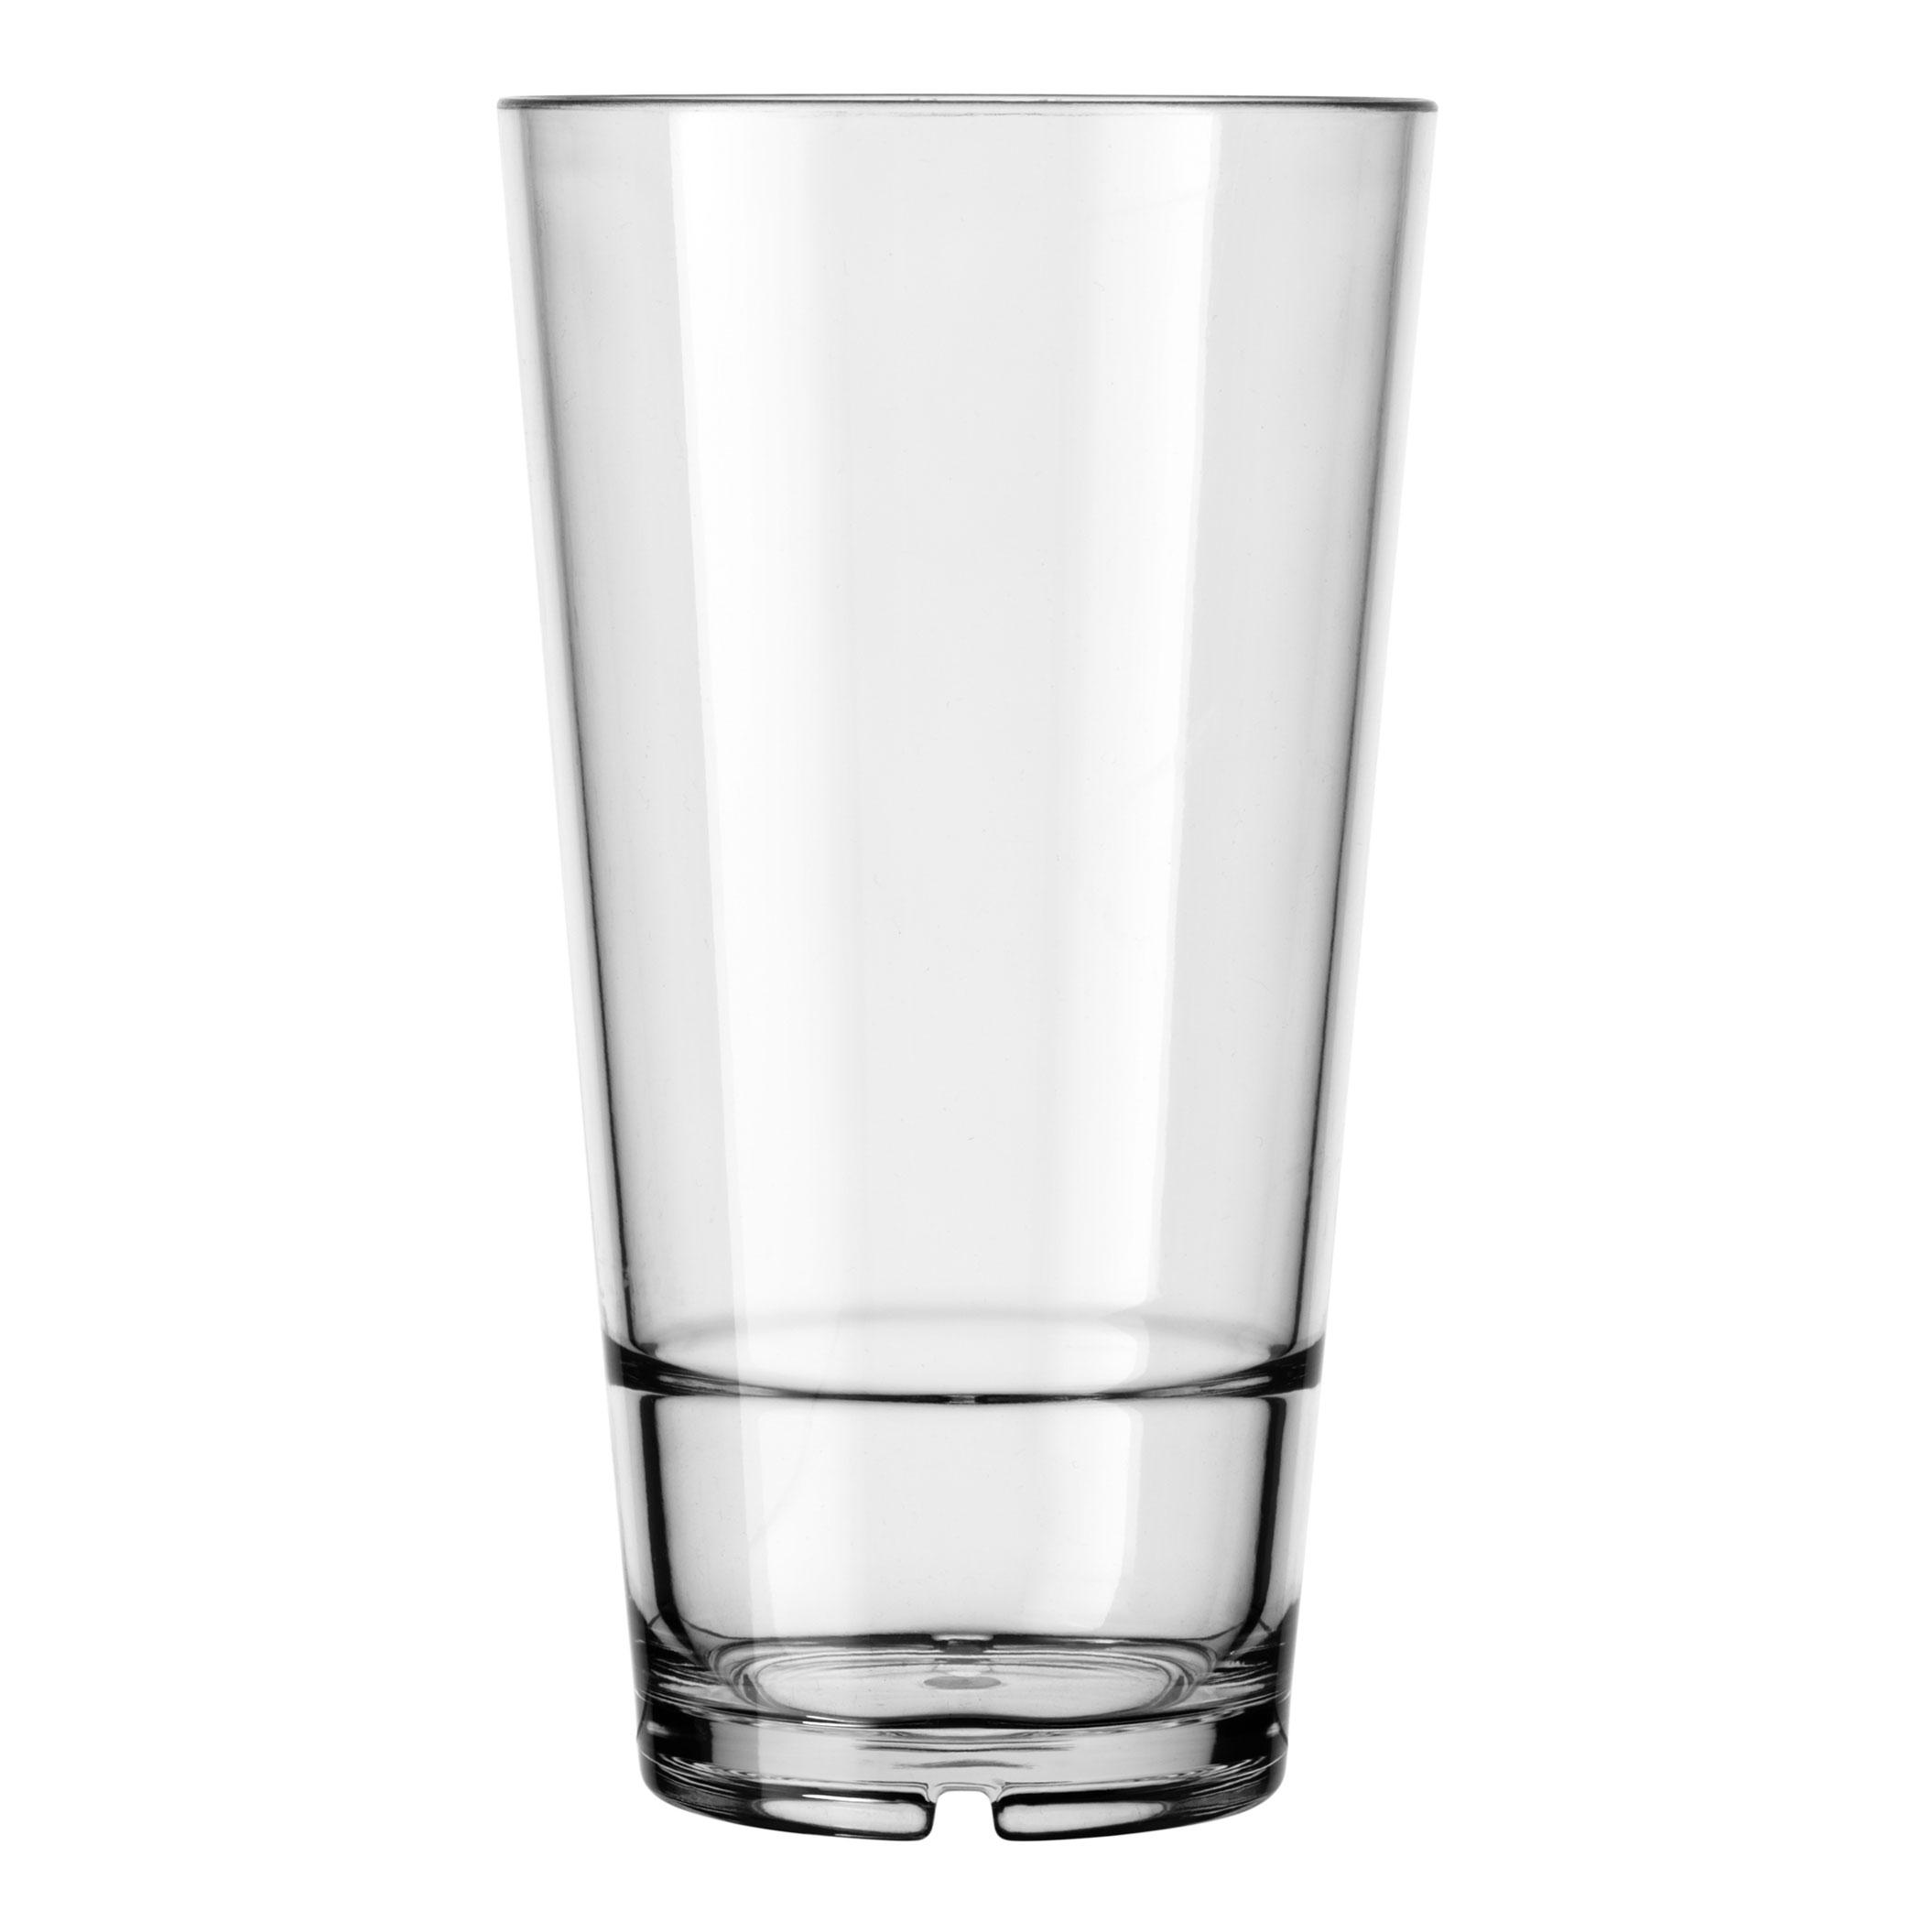 Libbey Glass 92448 glassware, plastic